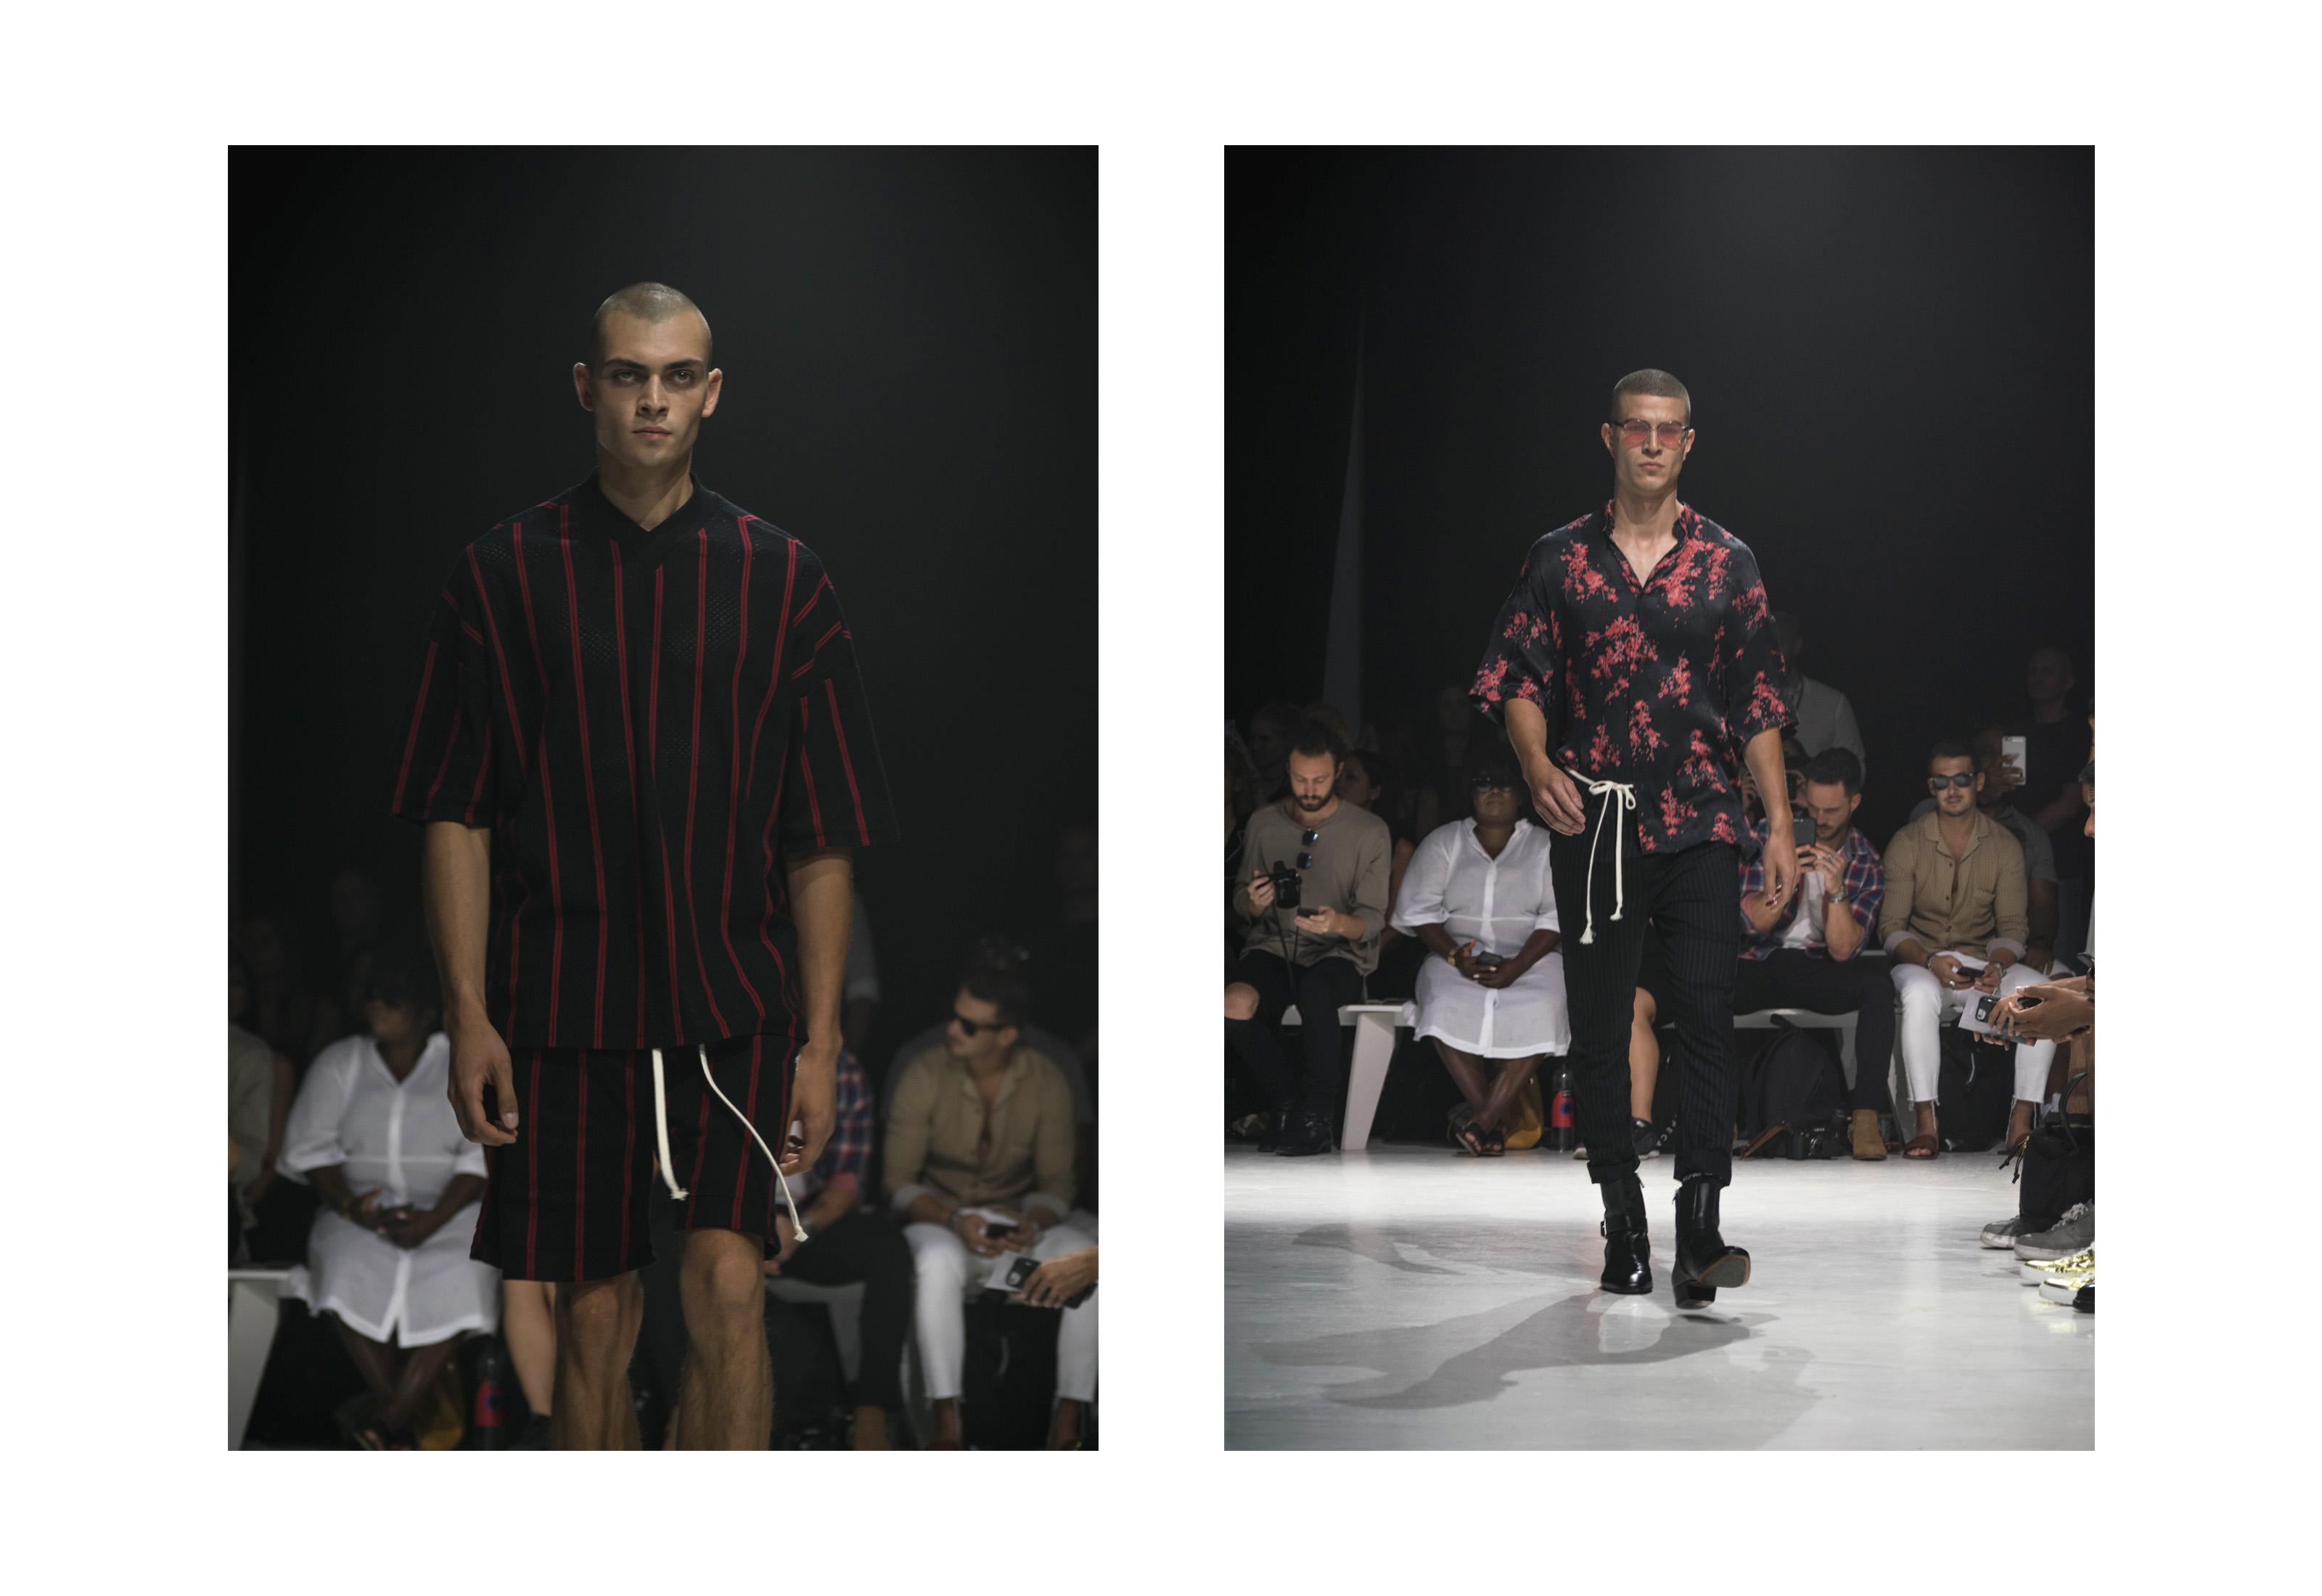 walker - Represent Clothing SS18 Highlights from New York Fashion Week- Men's 2017 - FilterGrade Blog